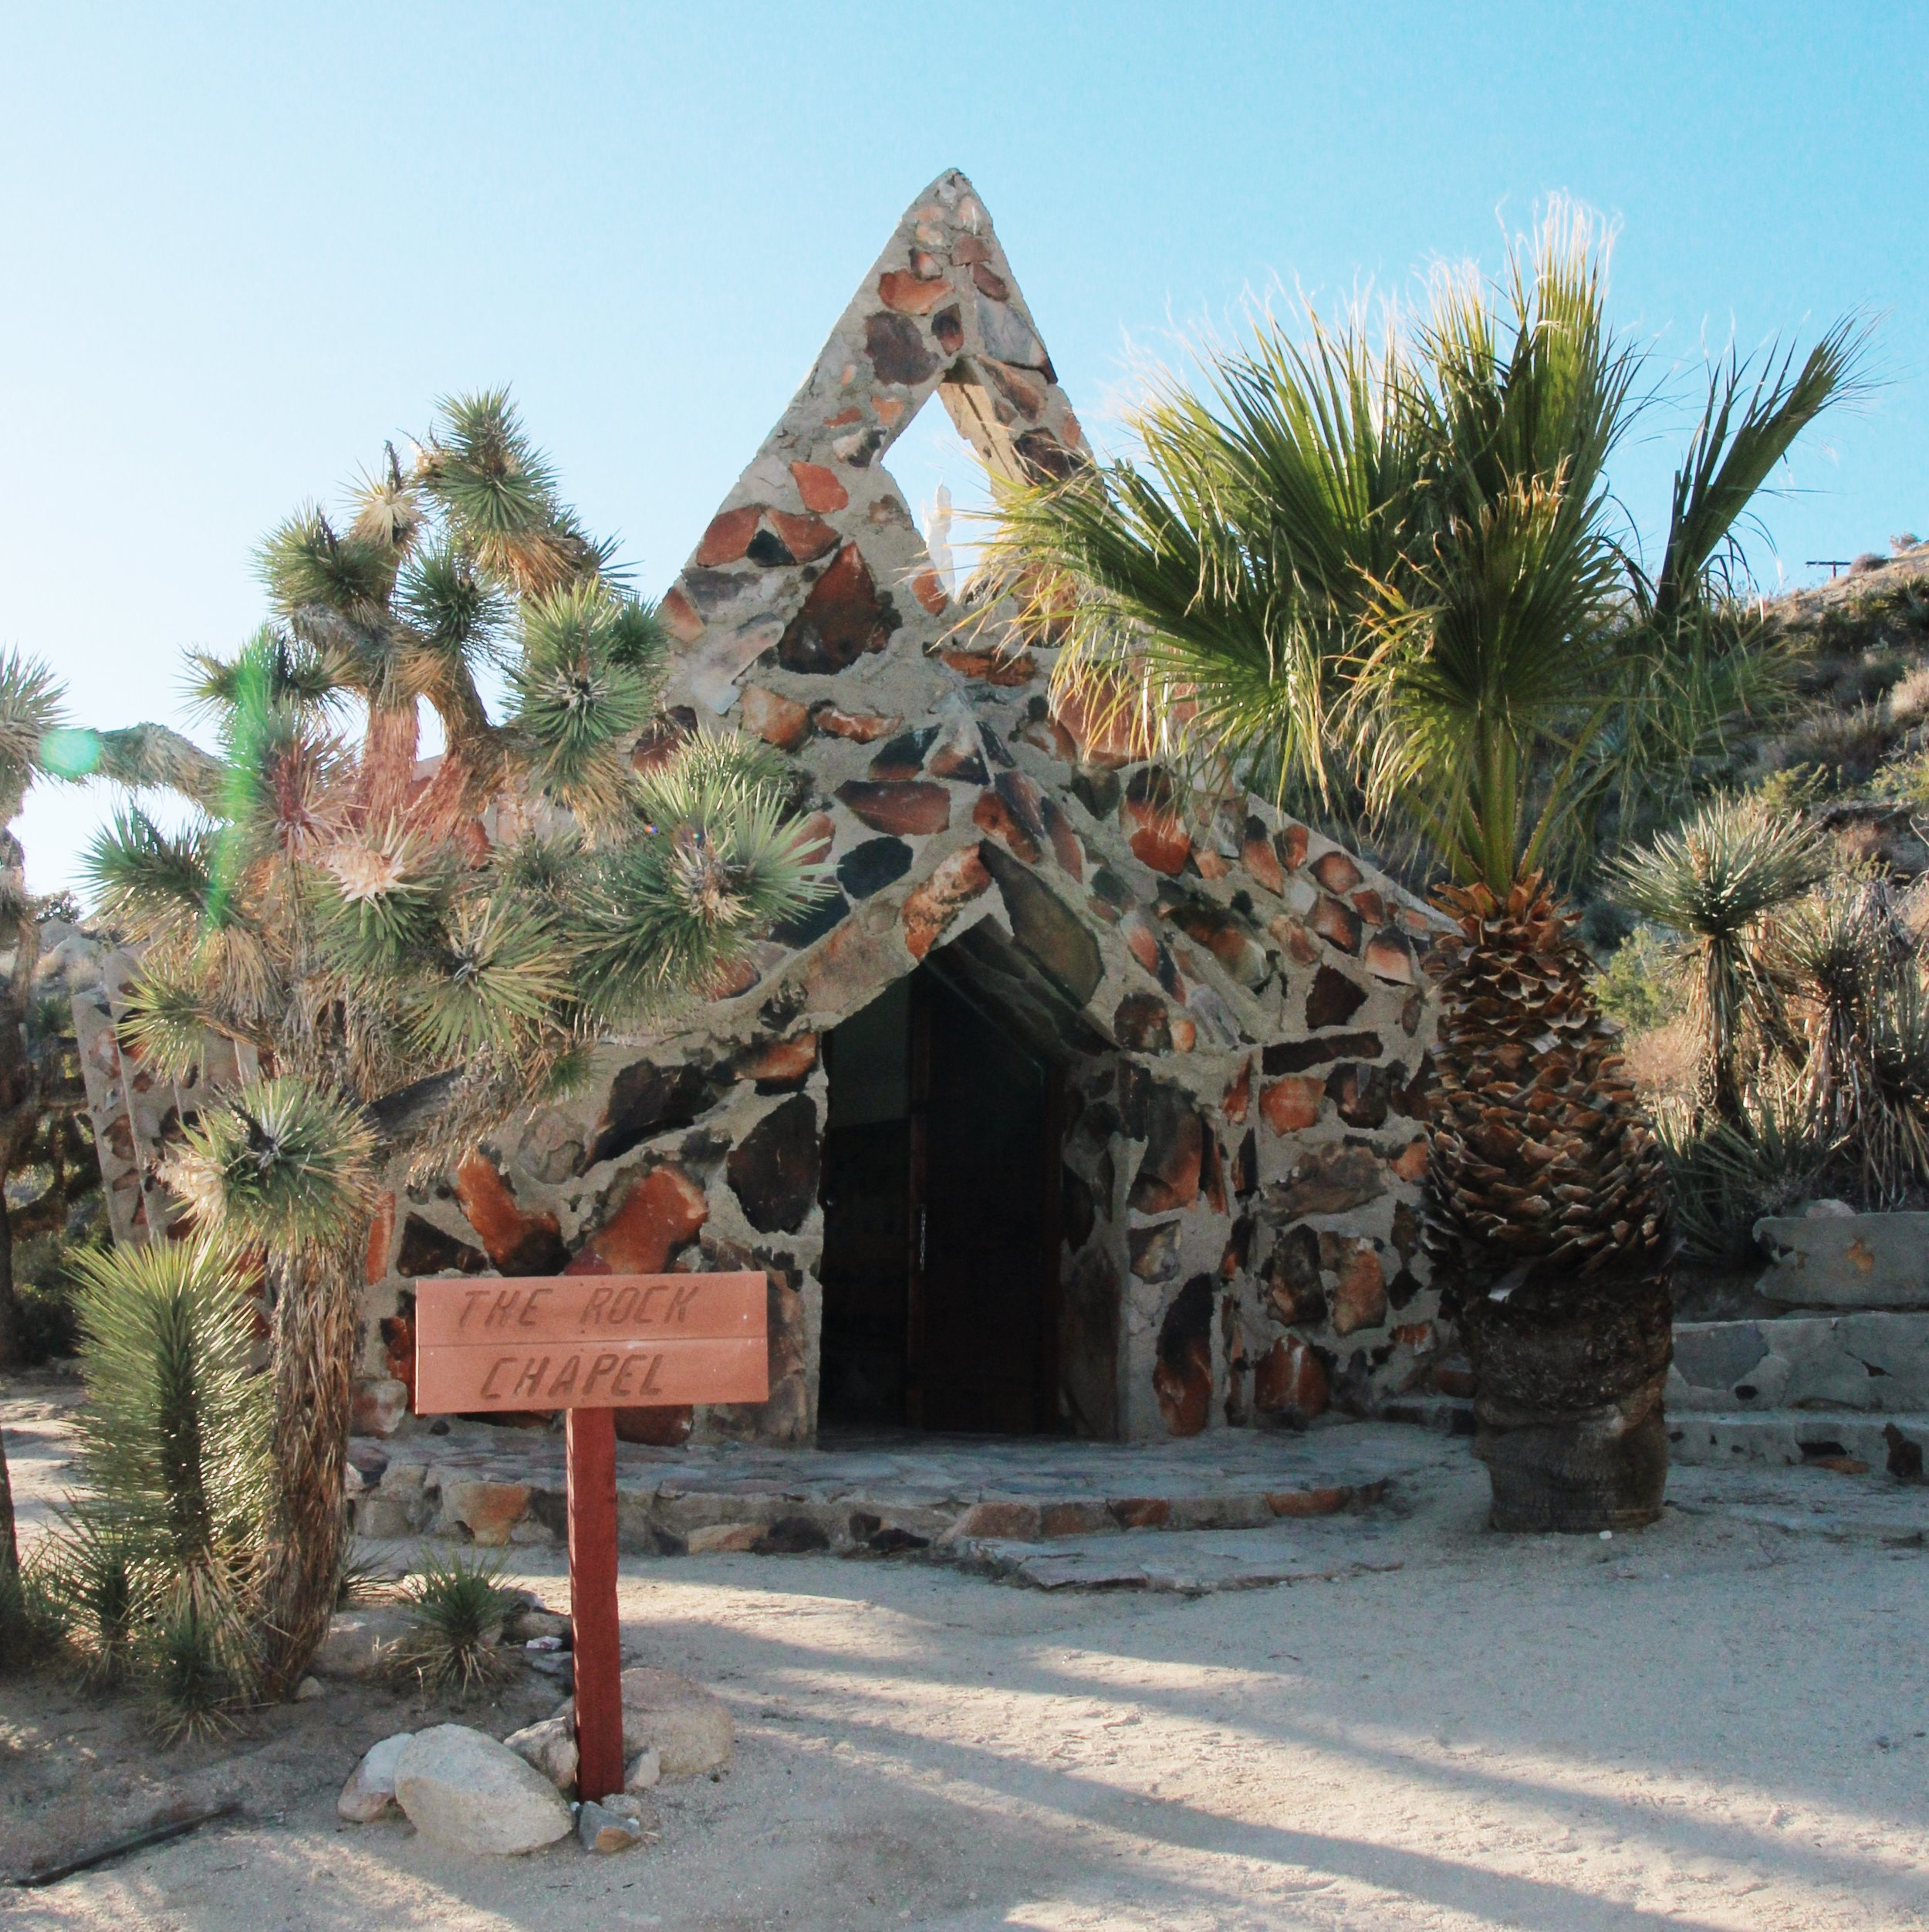 chrissihernandez-california-yuccavalley-desertchristpark (7).JPG